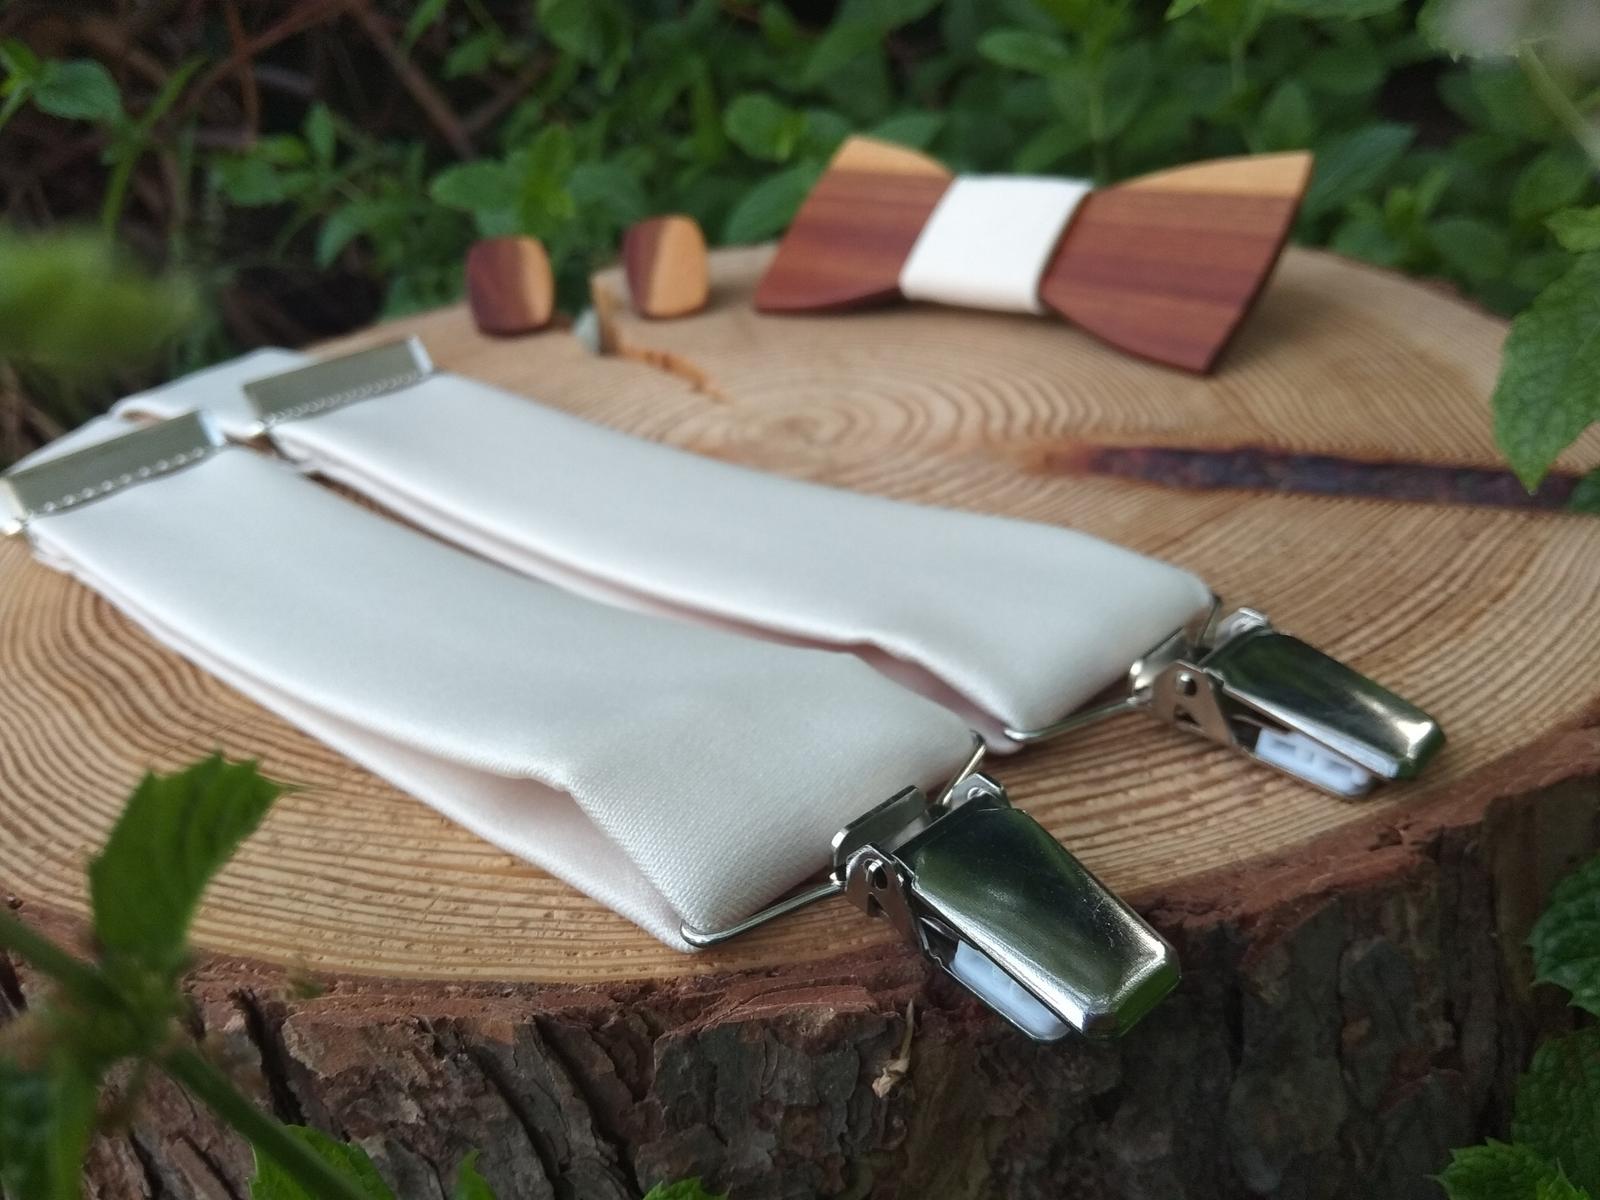 Pánsky drevený motýlik, manžetové gombíky a traky - Obrázok č. 3